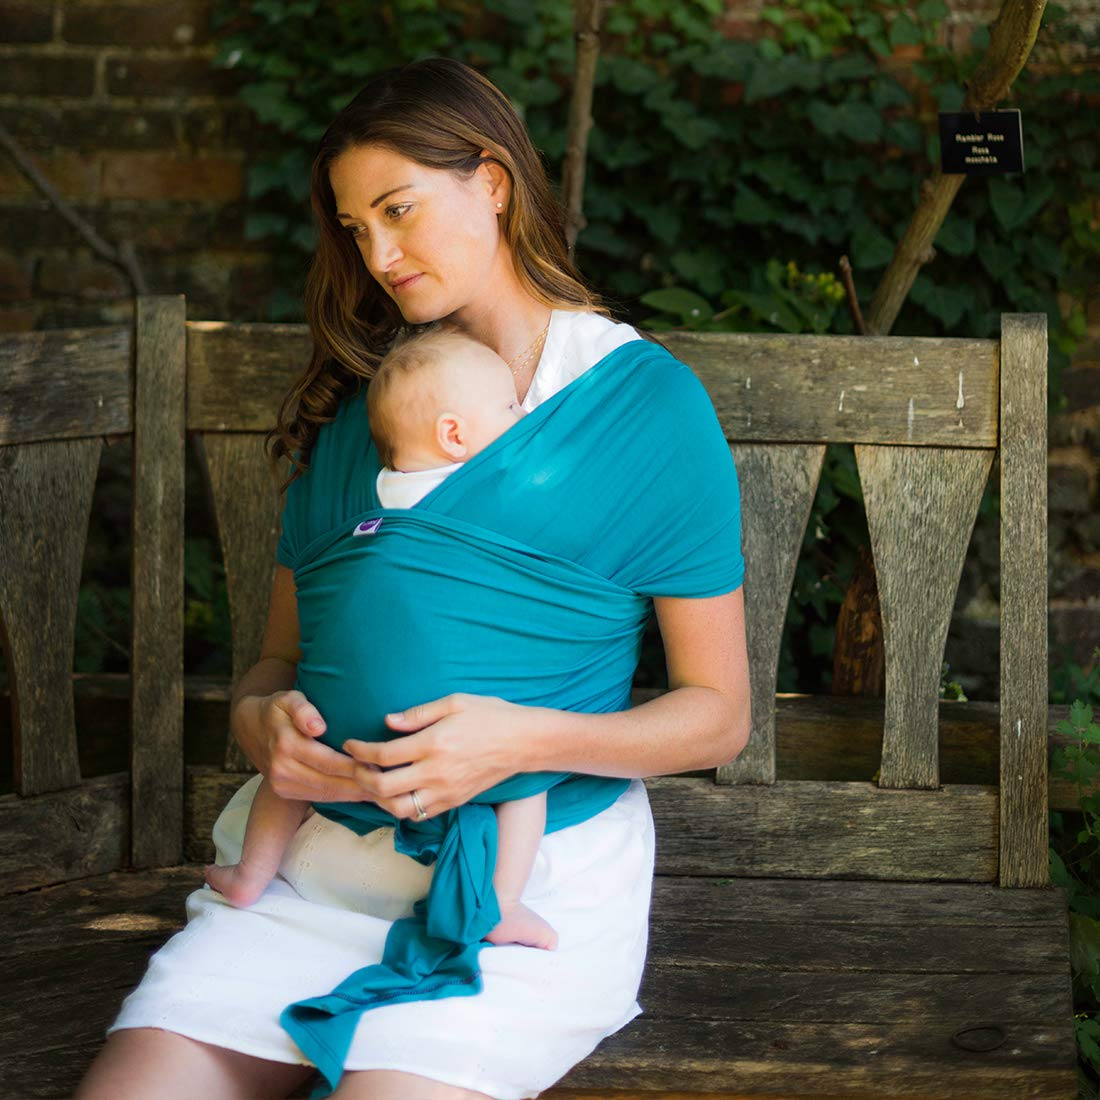 Slate Ideal for Newborns Izmi Wrap Made from Soft Bamboo